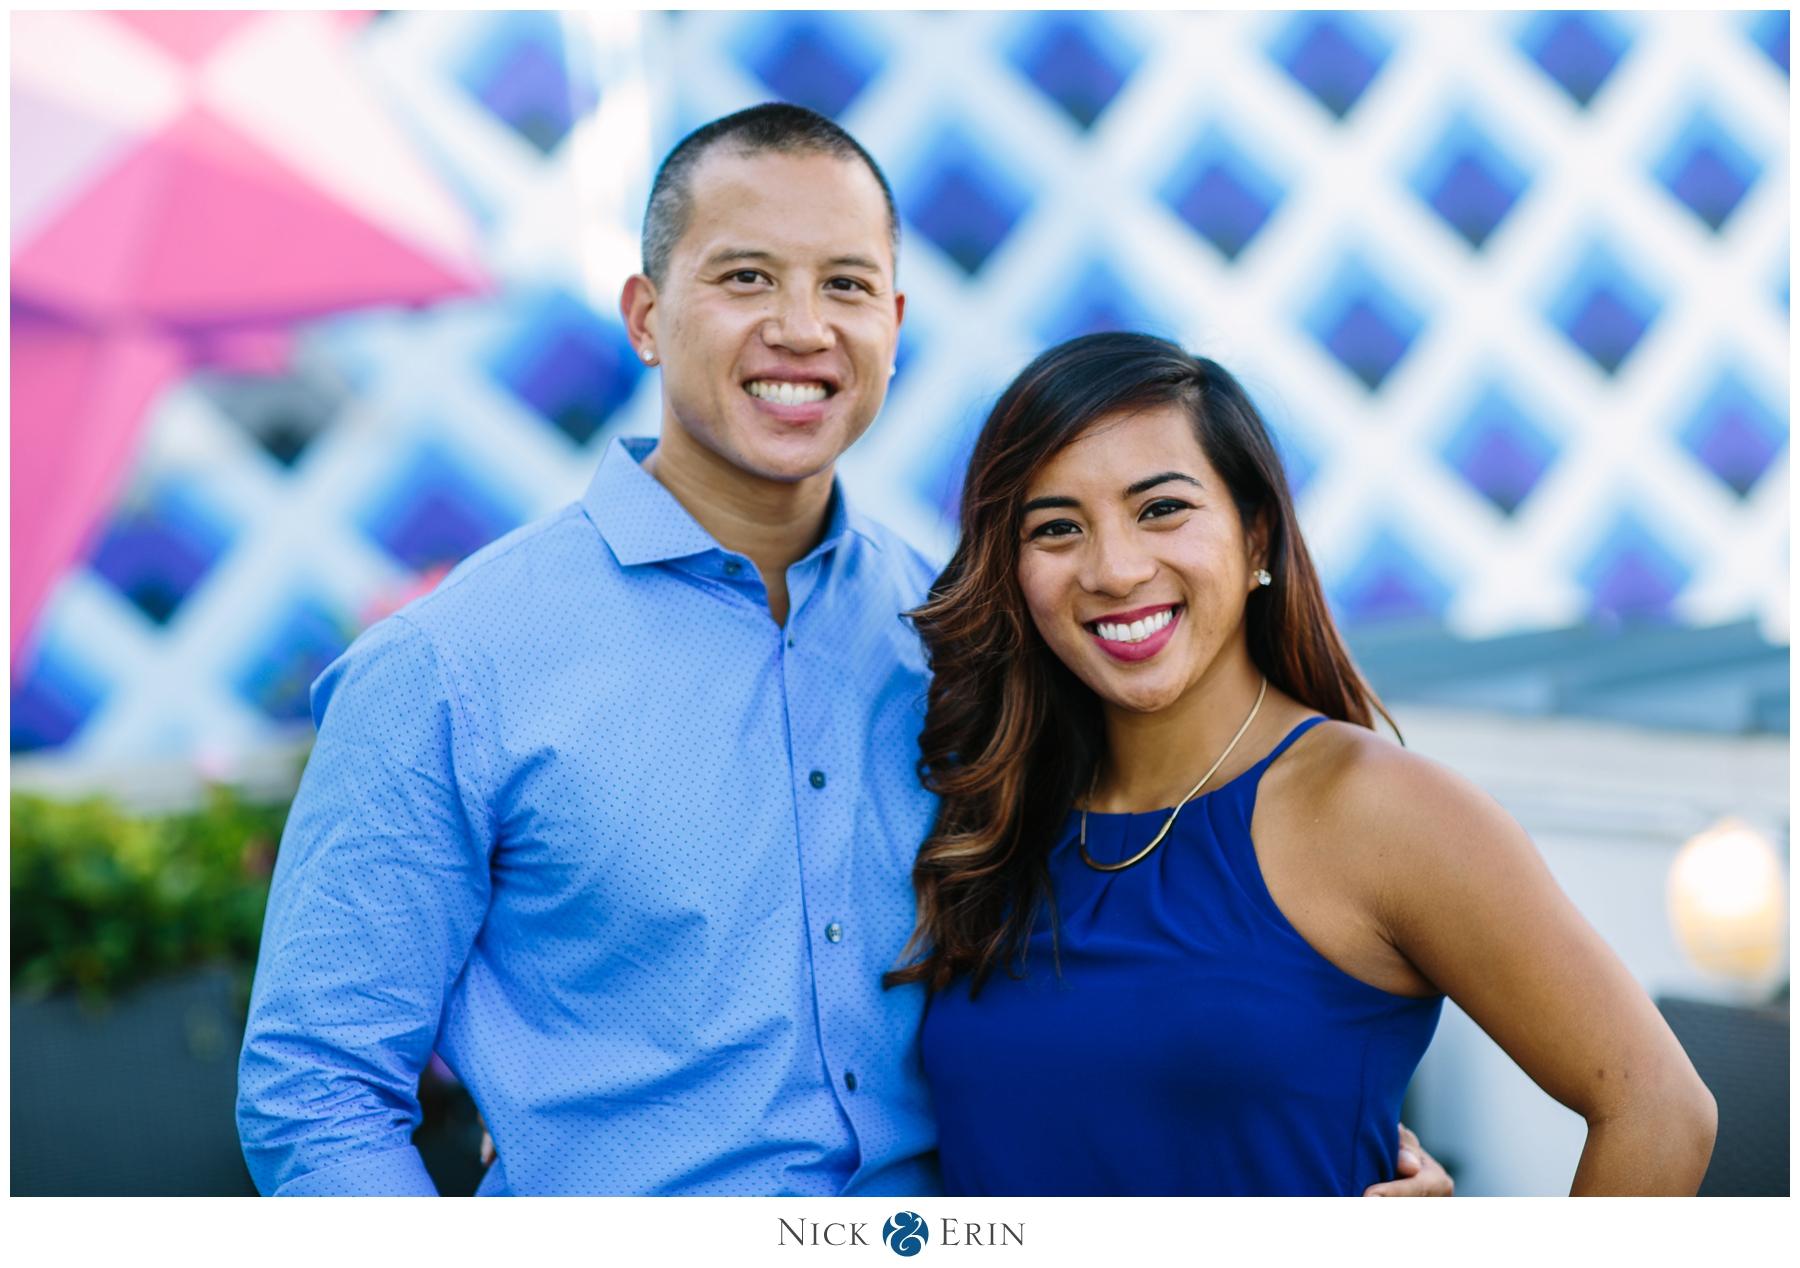 Donner_Photography_Washington DC Engagement Session_Jenny Mae & Vic_0014